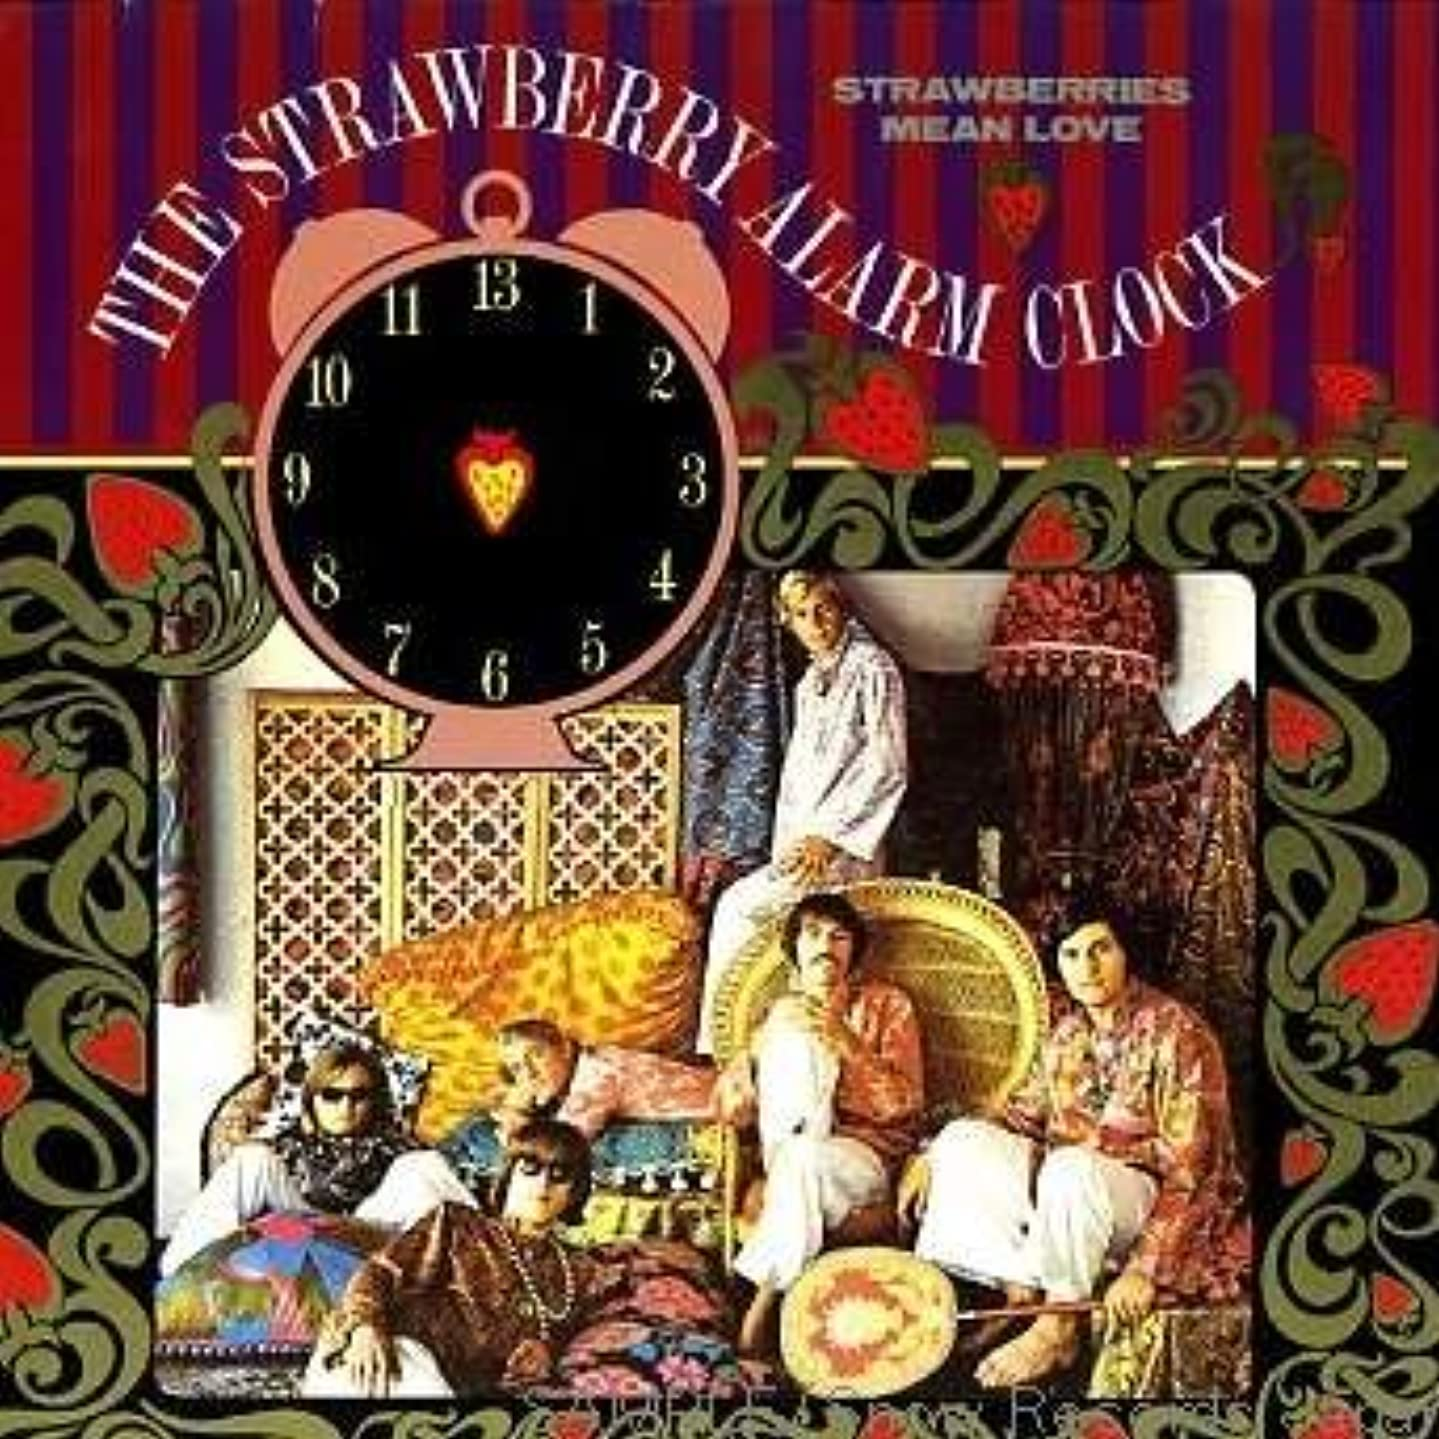 Strawberry Alarm Clock - Strawberries Mean Love - Big Beat Records - WIK 56